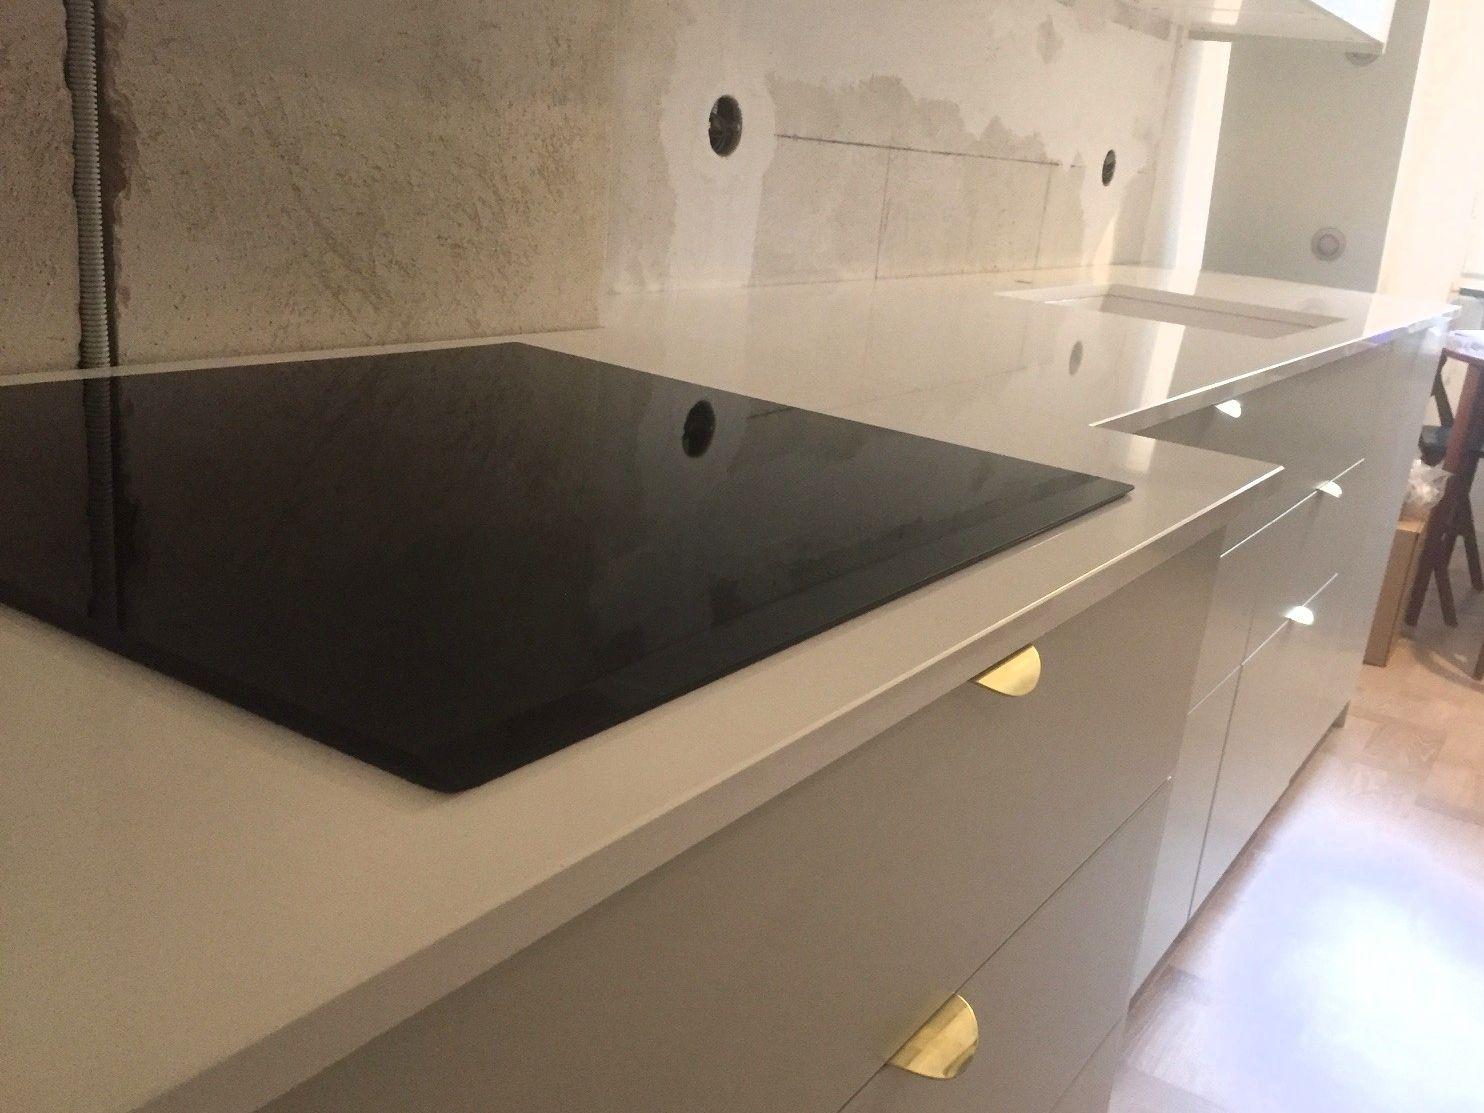 Crystal Absolute White i #köket! Riktigt fint blev det! #design #kök #instainredning #instahome #quartz #komposit #bättremedsten